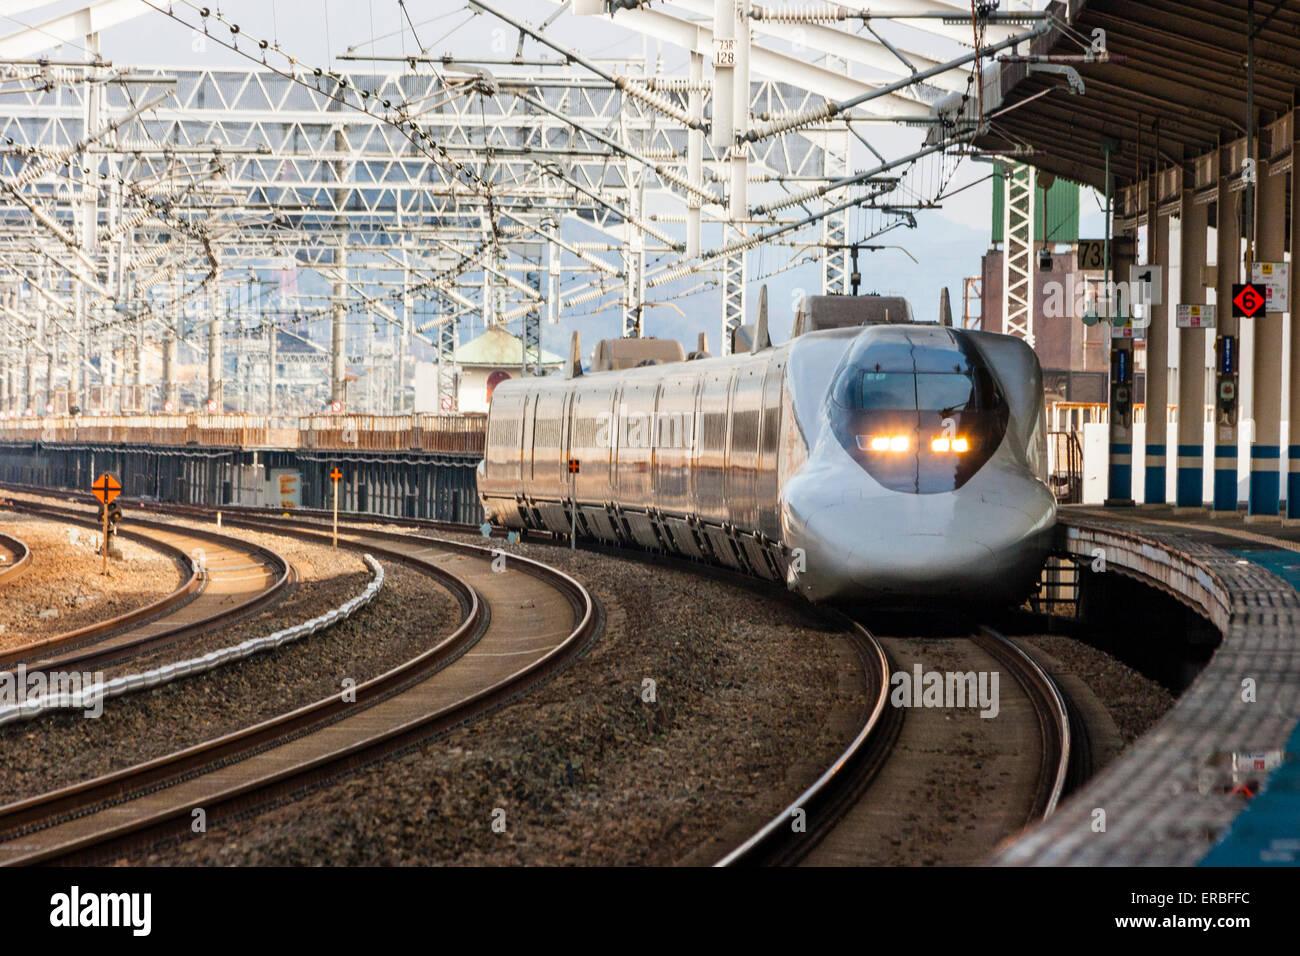 Japan Fukuyama Japanese Railway Shinkansen Bullet Train